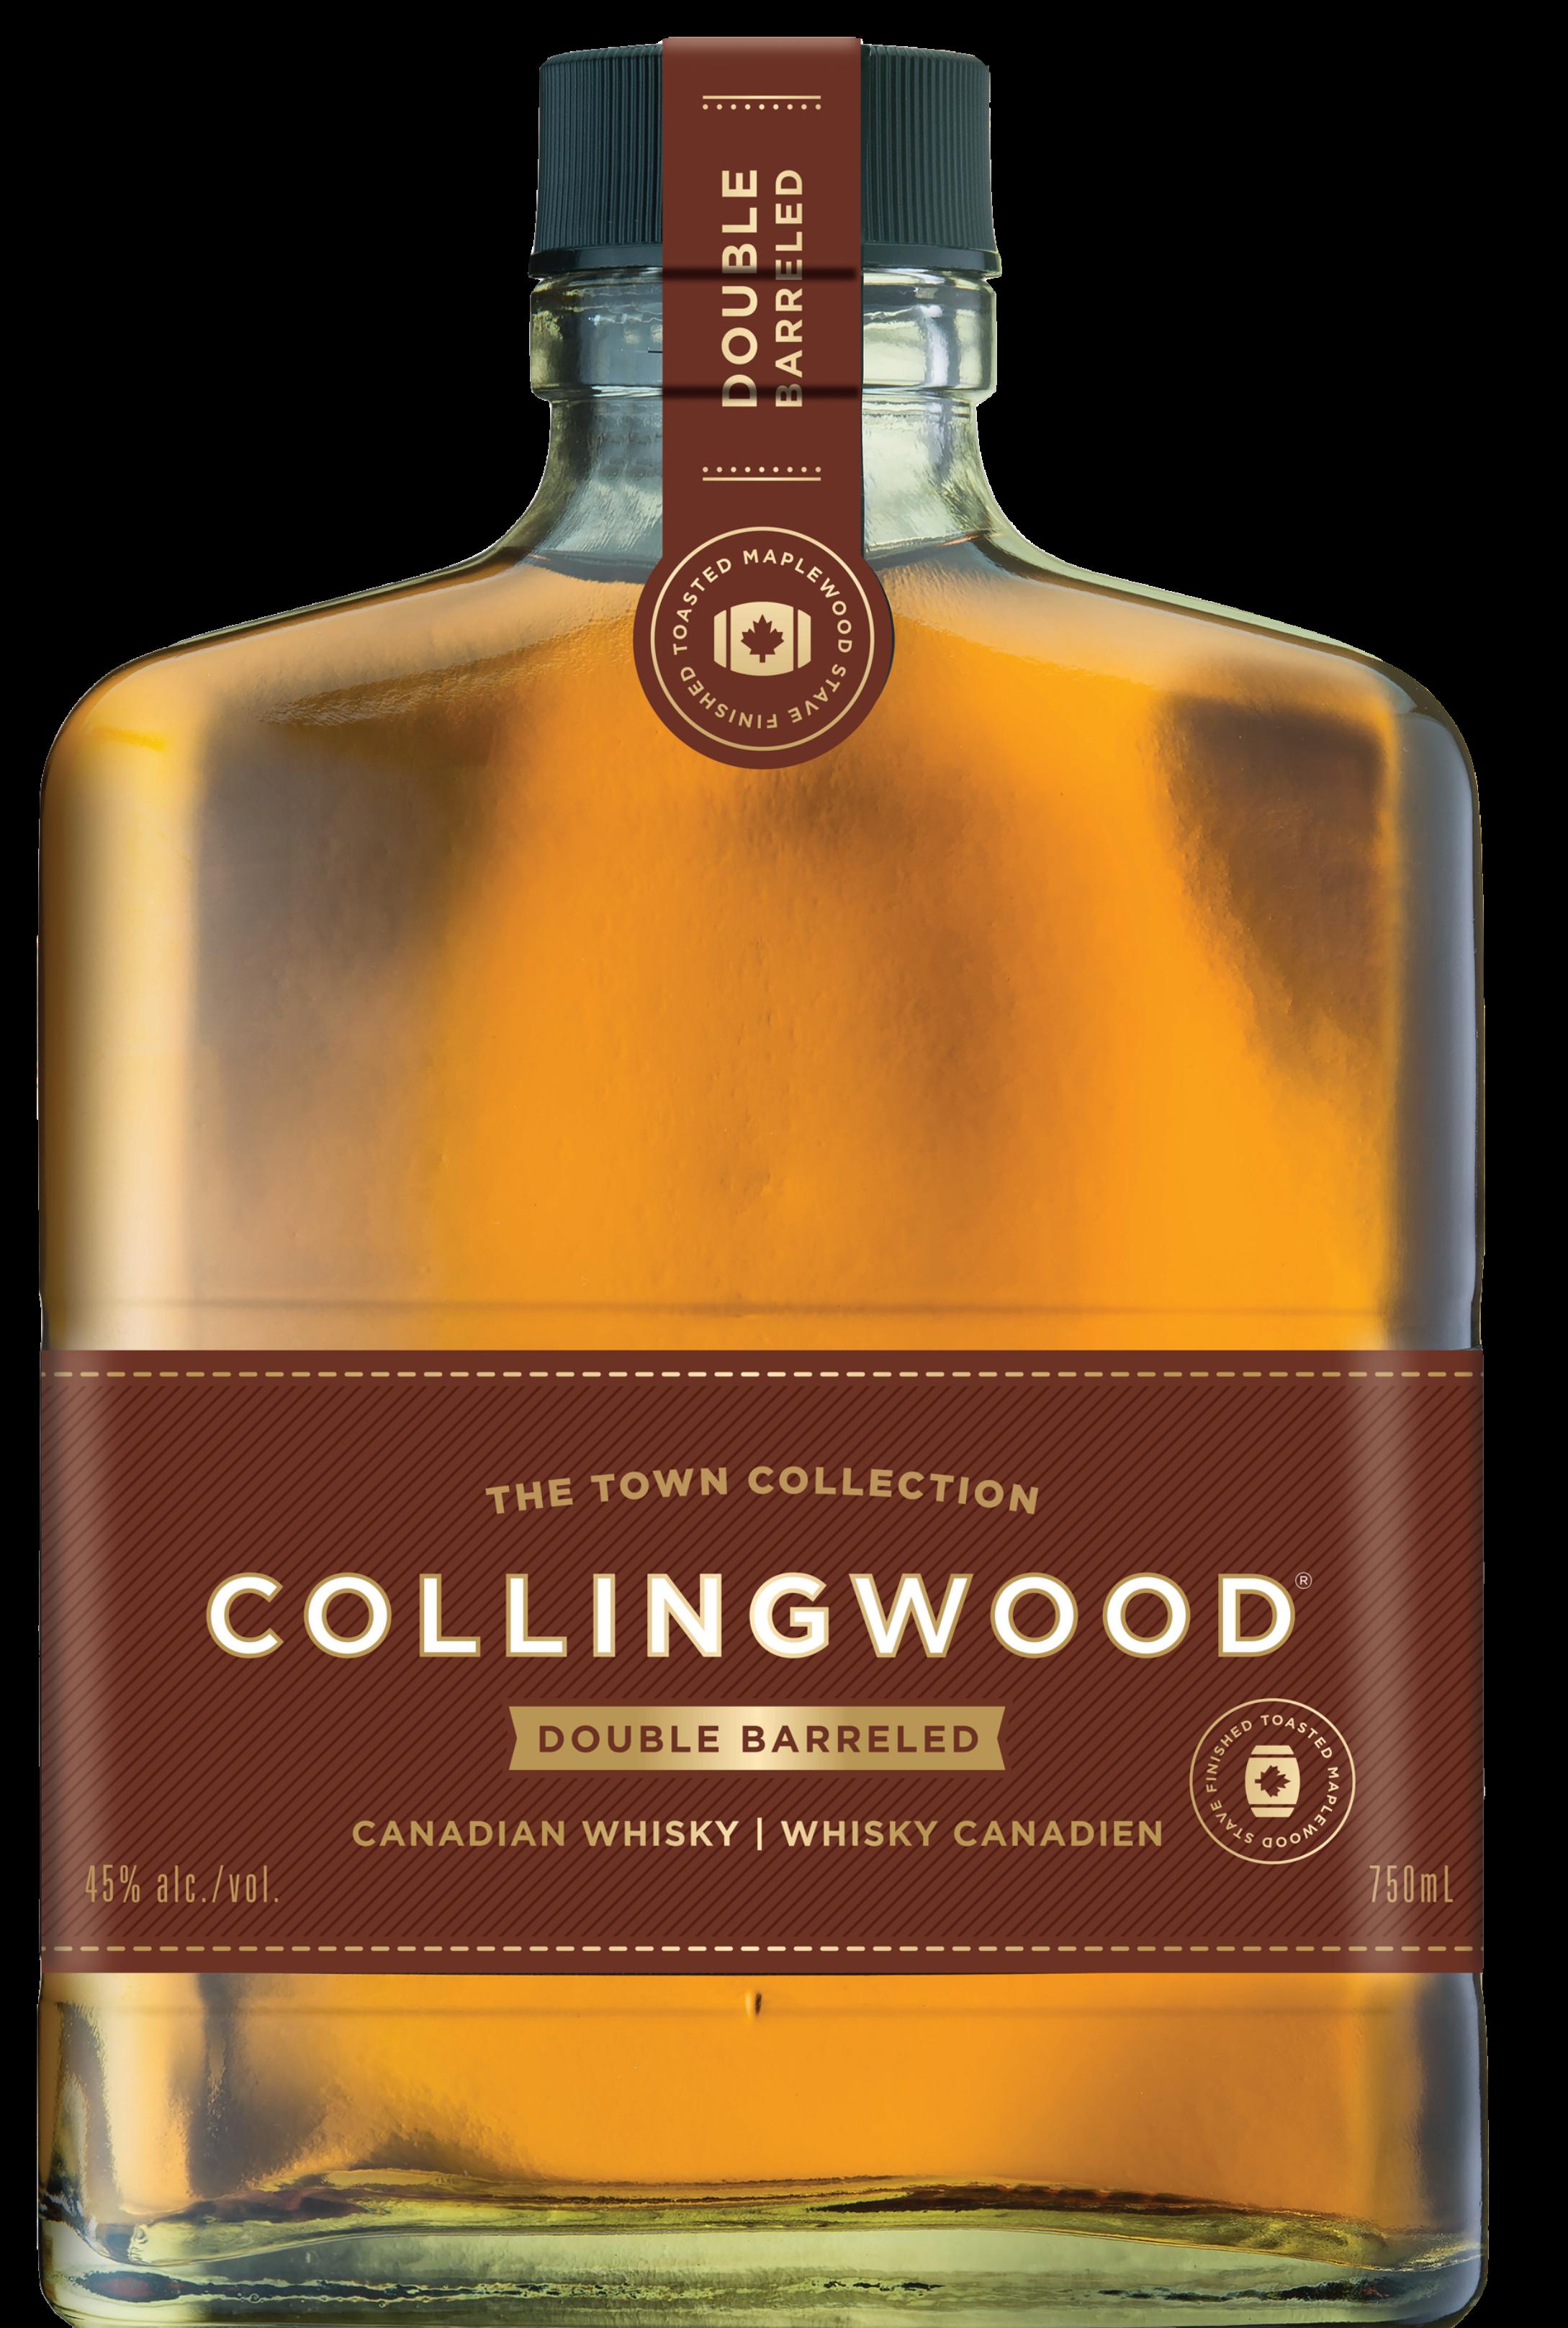 Collingwood Double Barreled